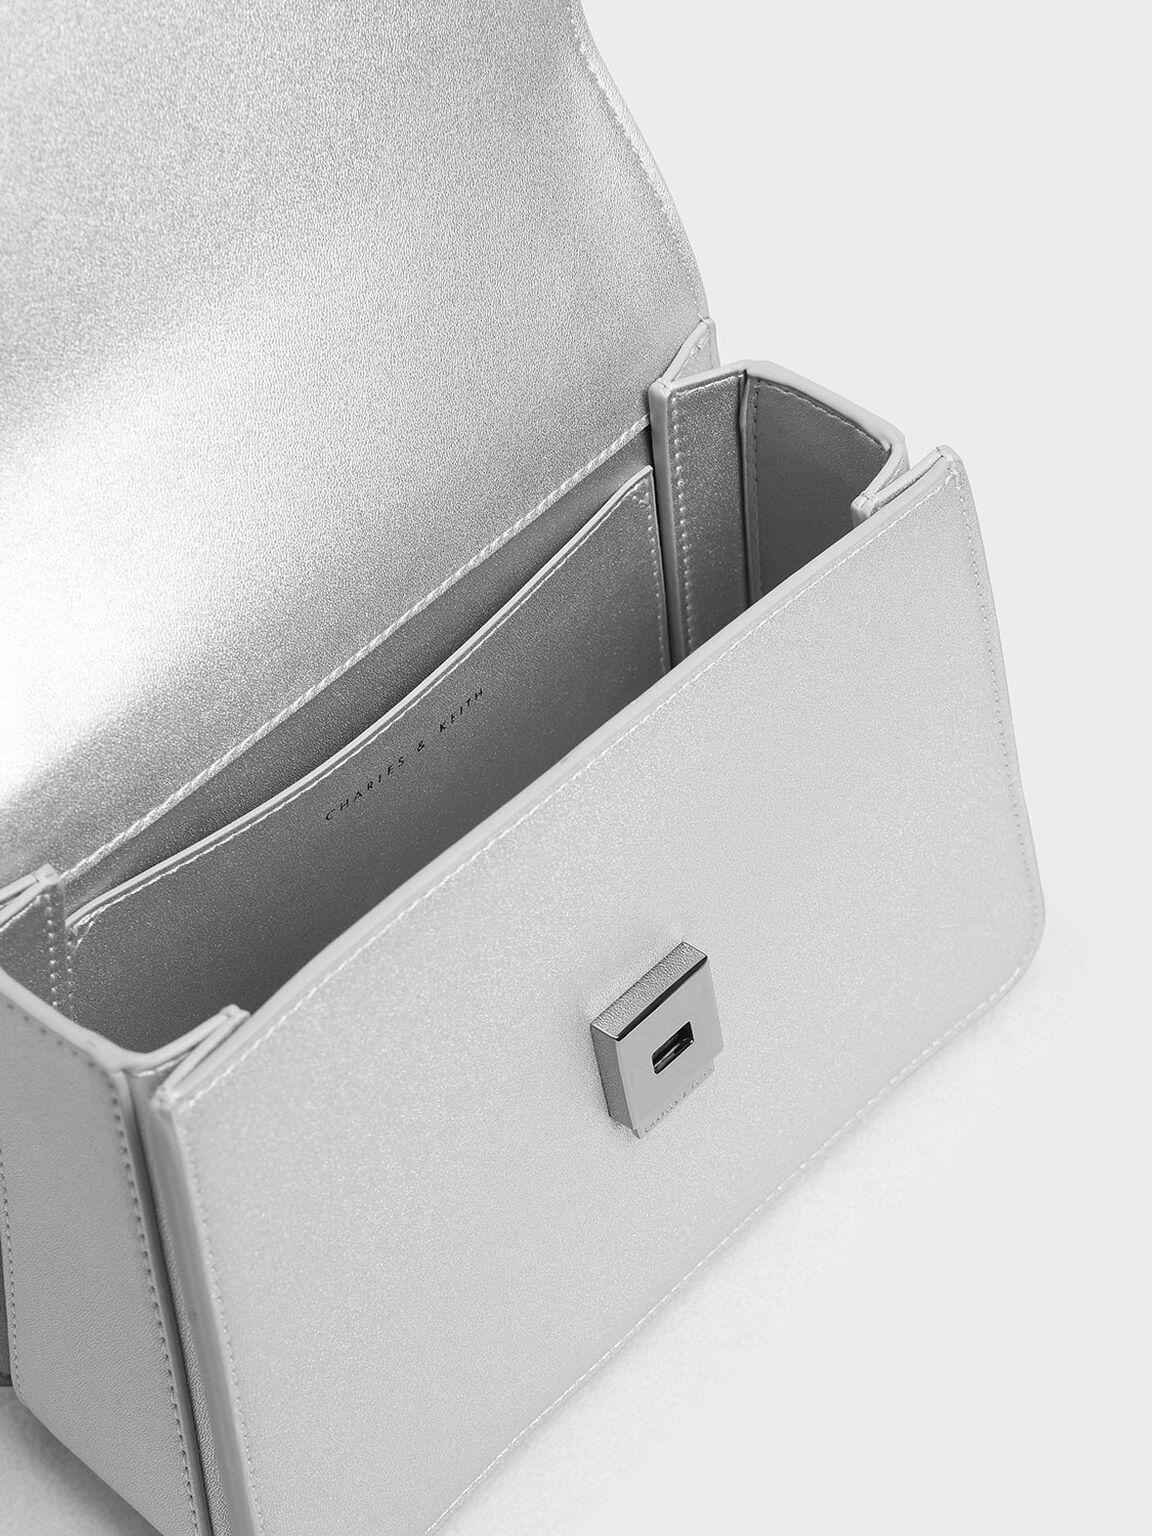 Chain Link Front Flap Bag, Silver, hi-res